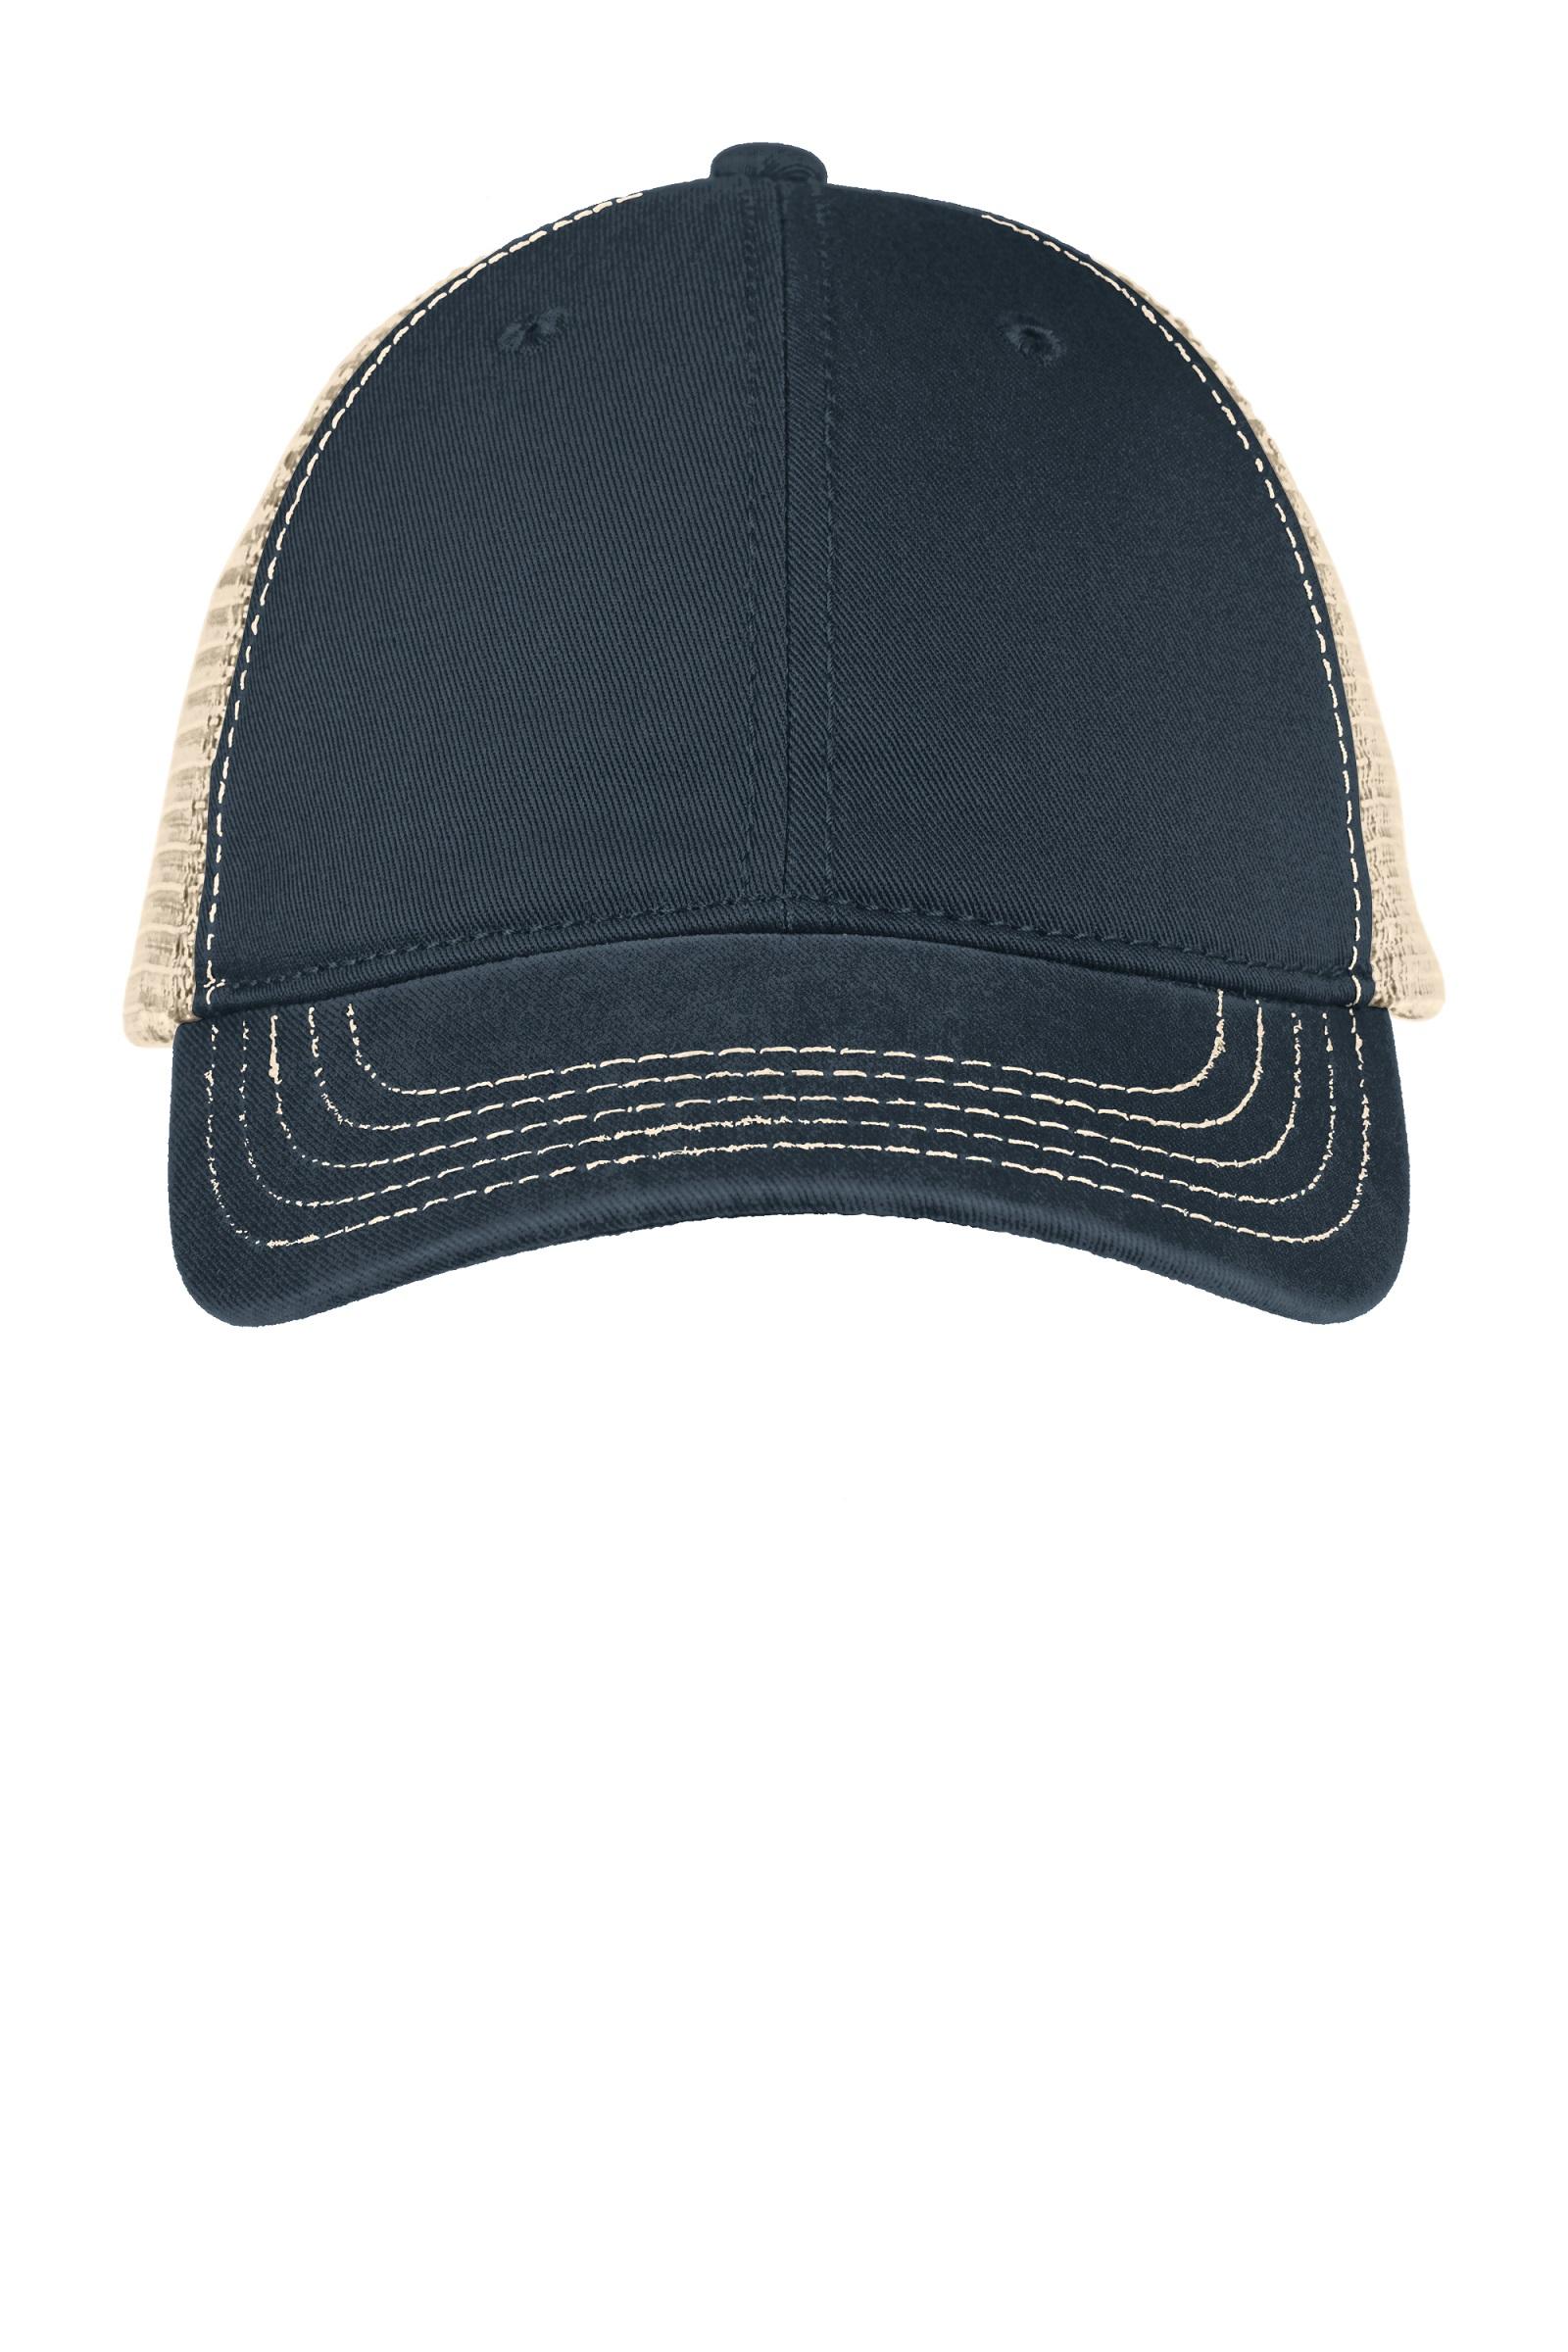 District  Embroidered Super Soft Mesh Back Cap